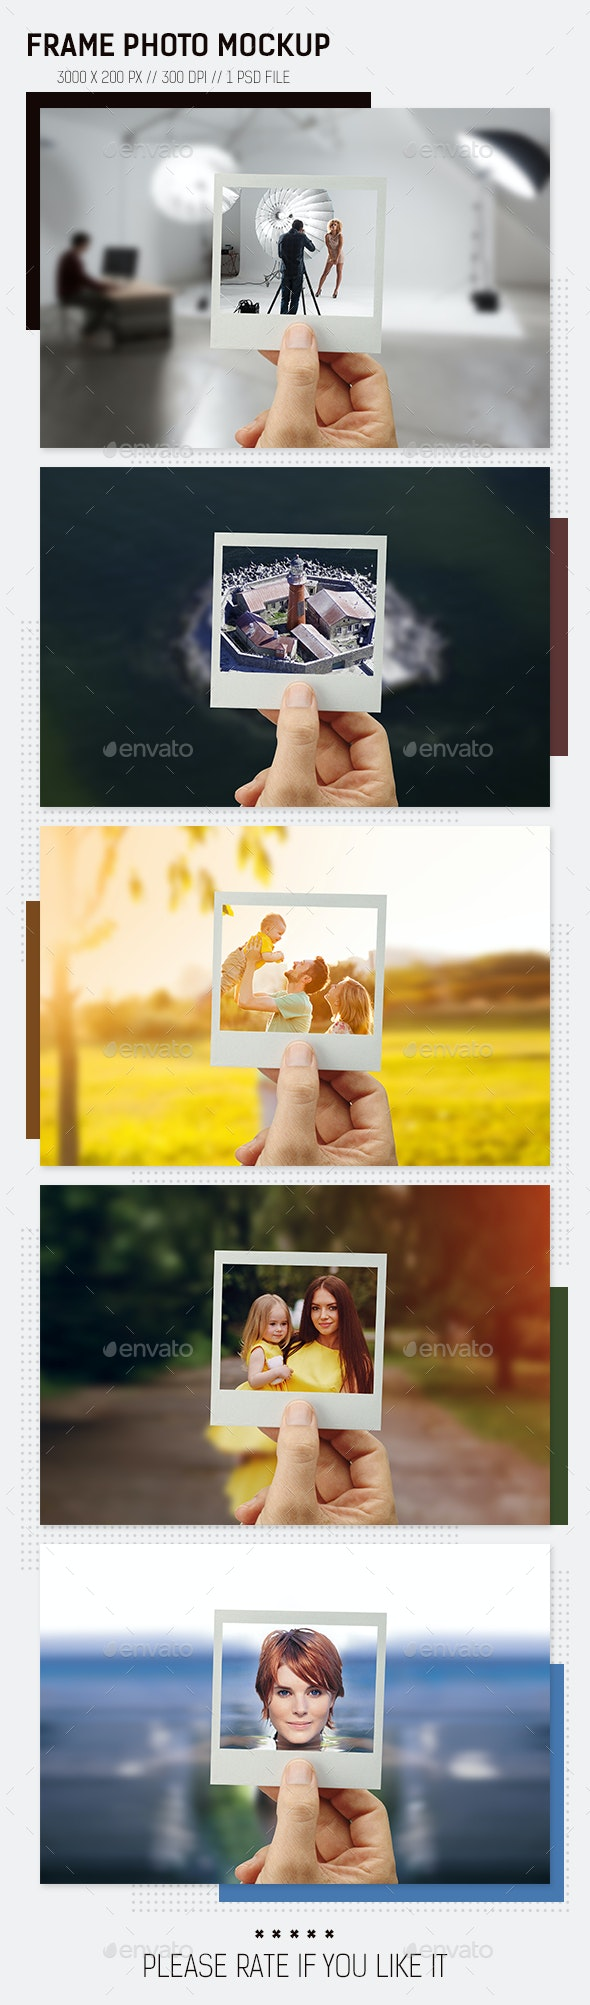 Frame Photo Mockup - Print Product Mock-Ups